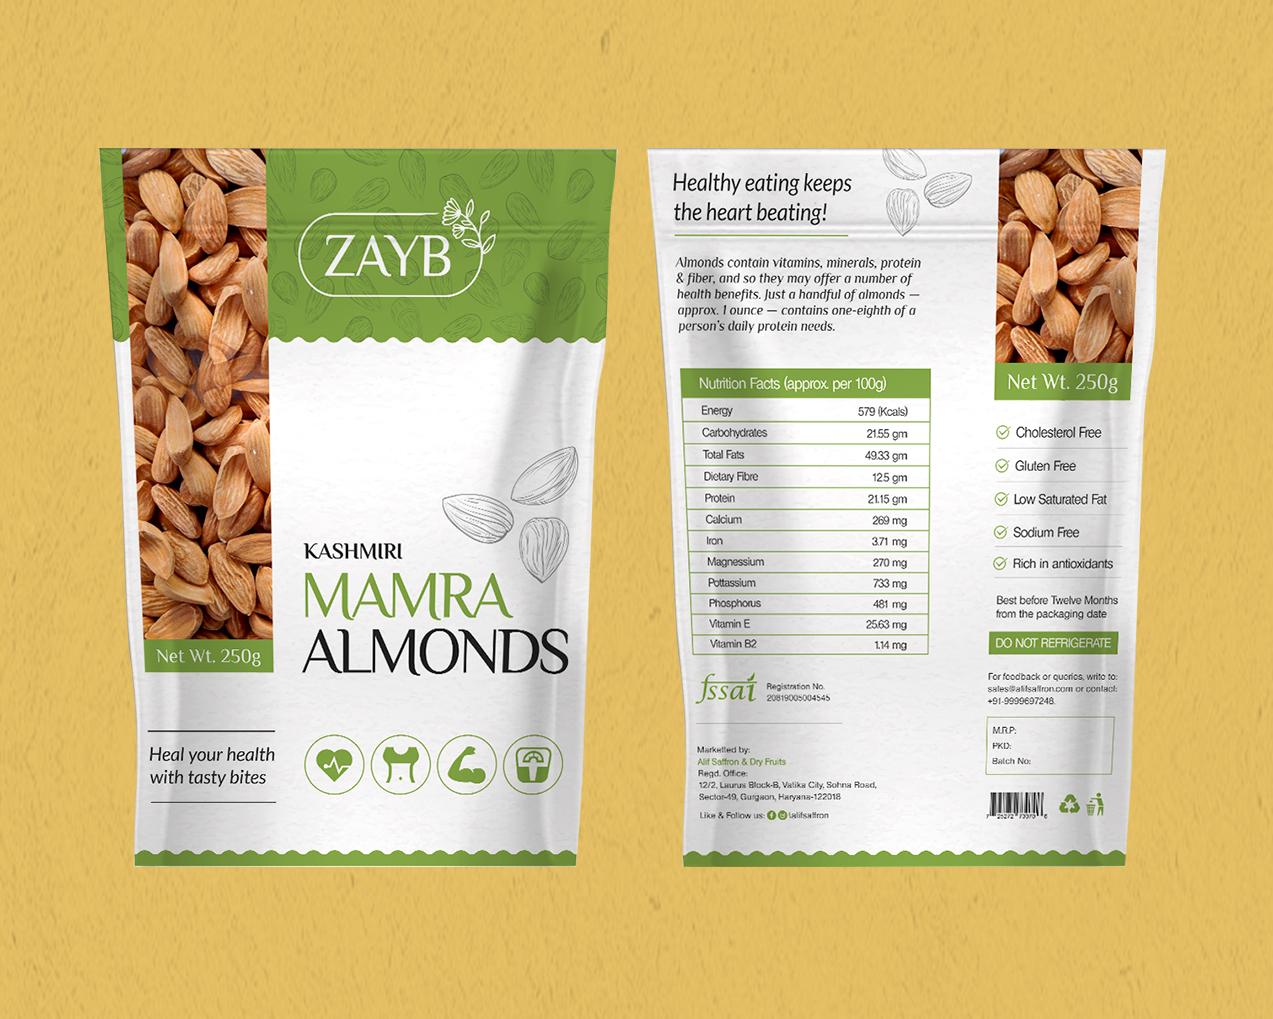 Mamra Almond Packaging